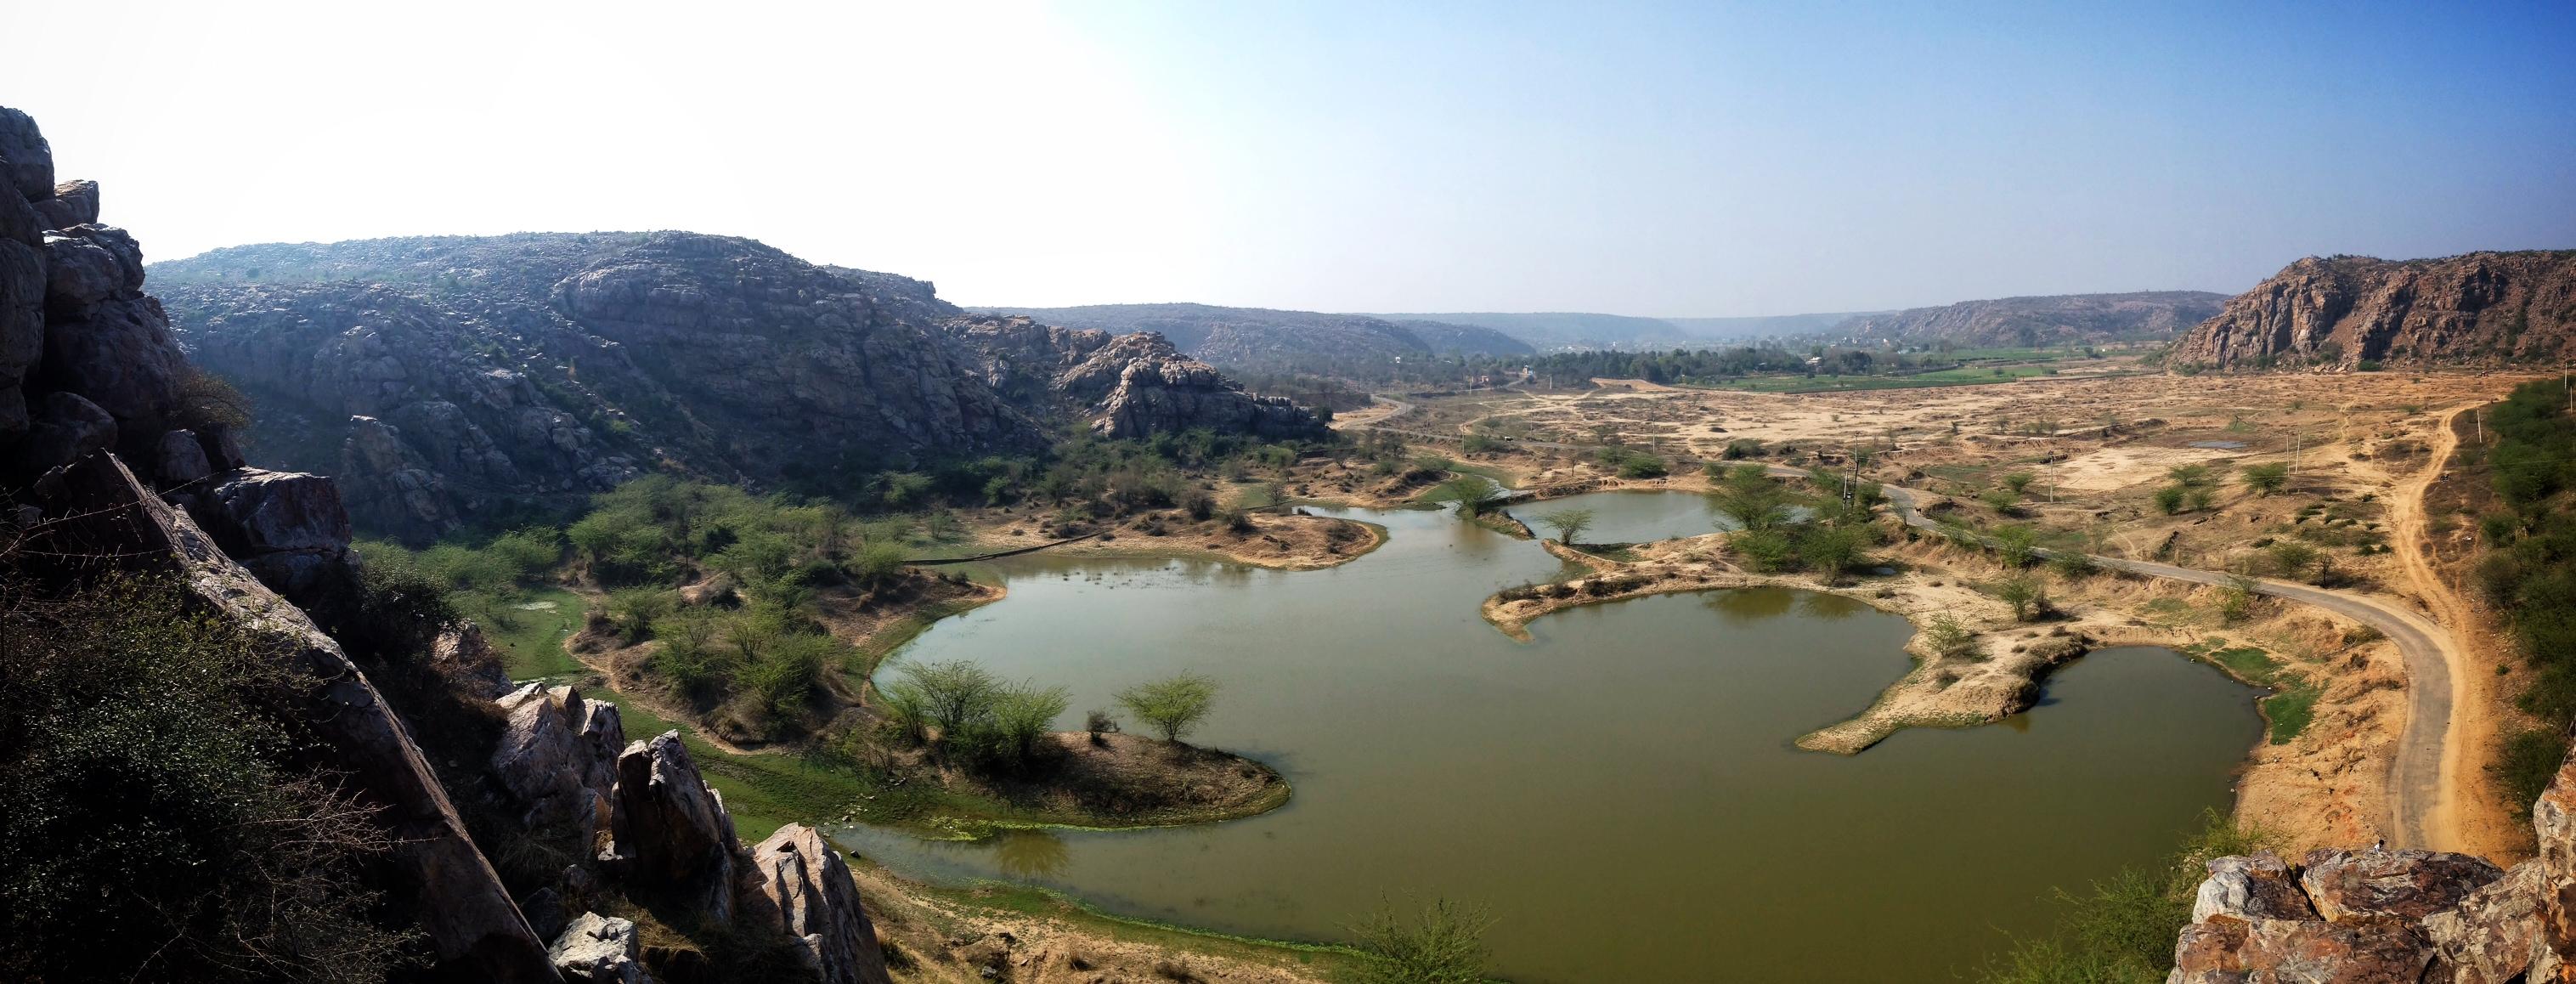 Landscape mountains view Haryana New Delhi India photo